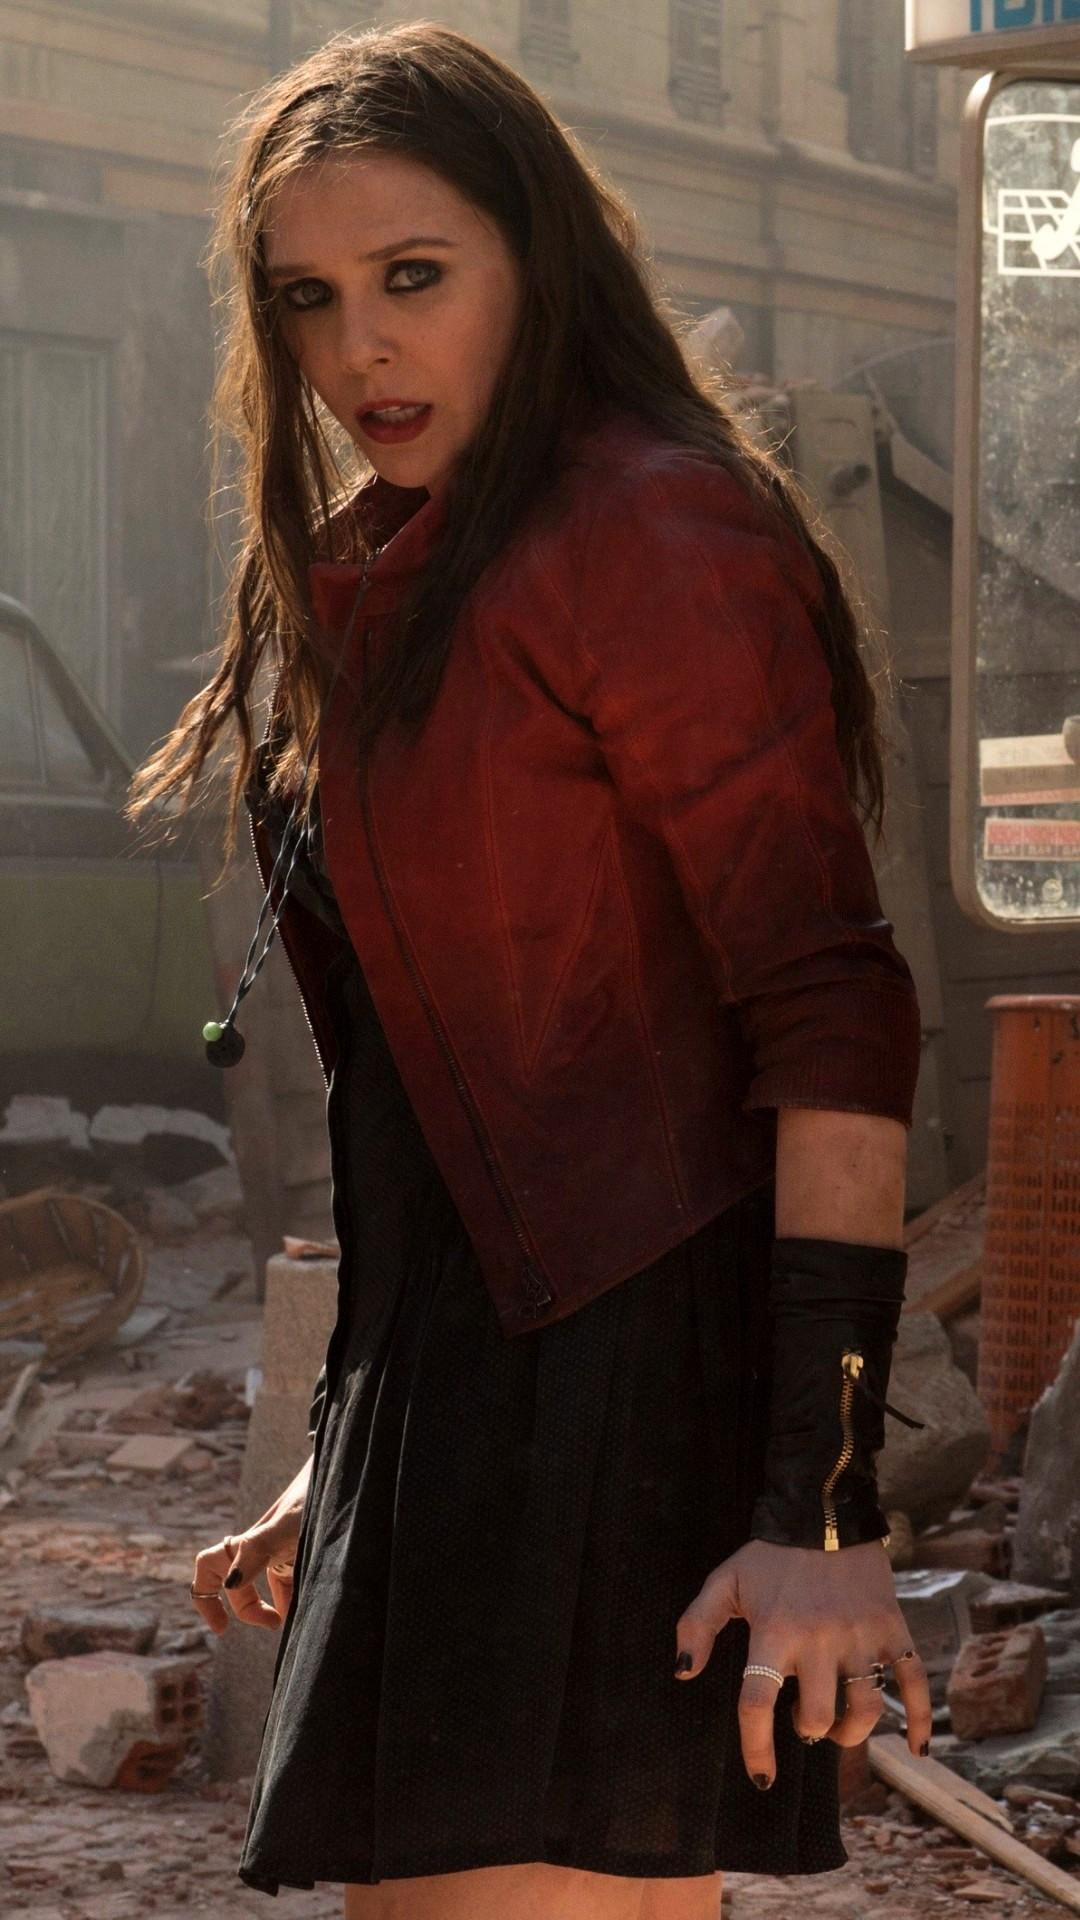 Elizabeth Olsen As Scarlet Witch Wallpapers 1080x1920 437256